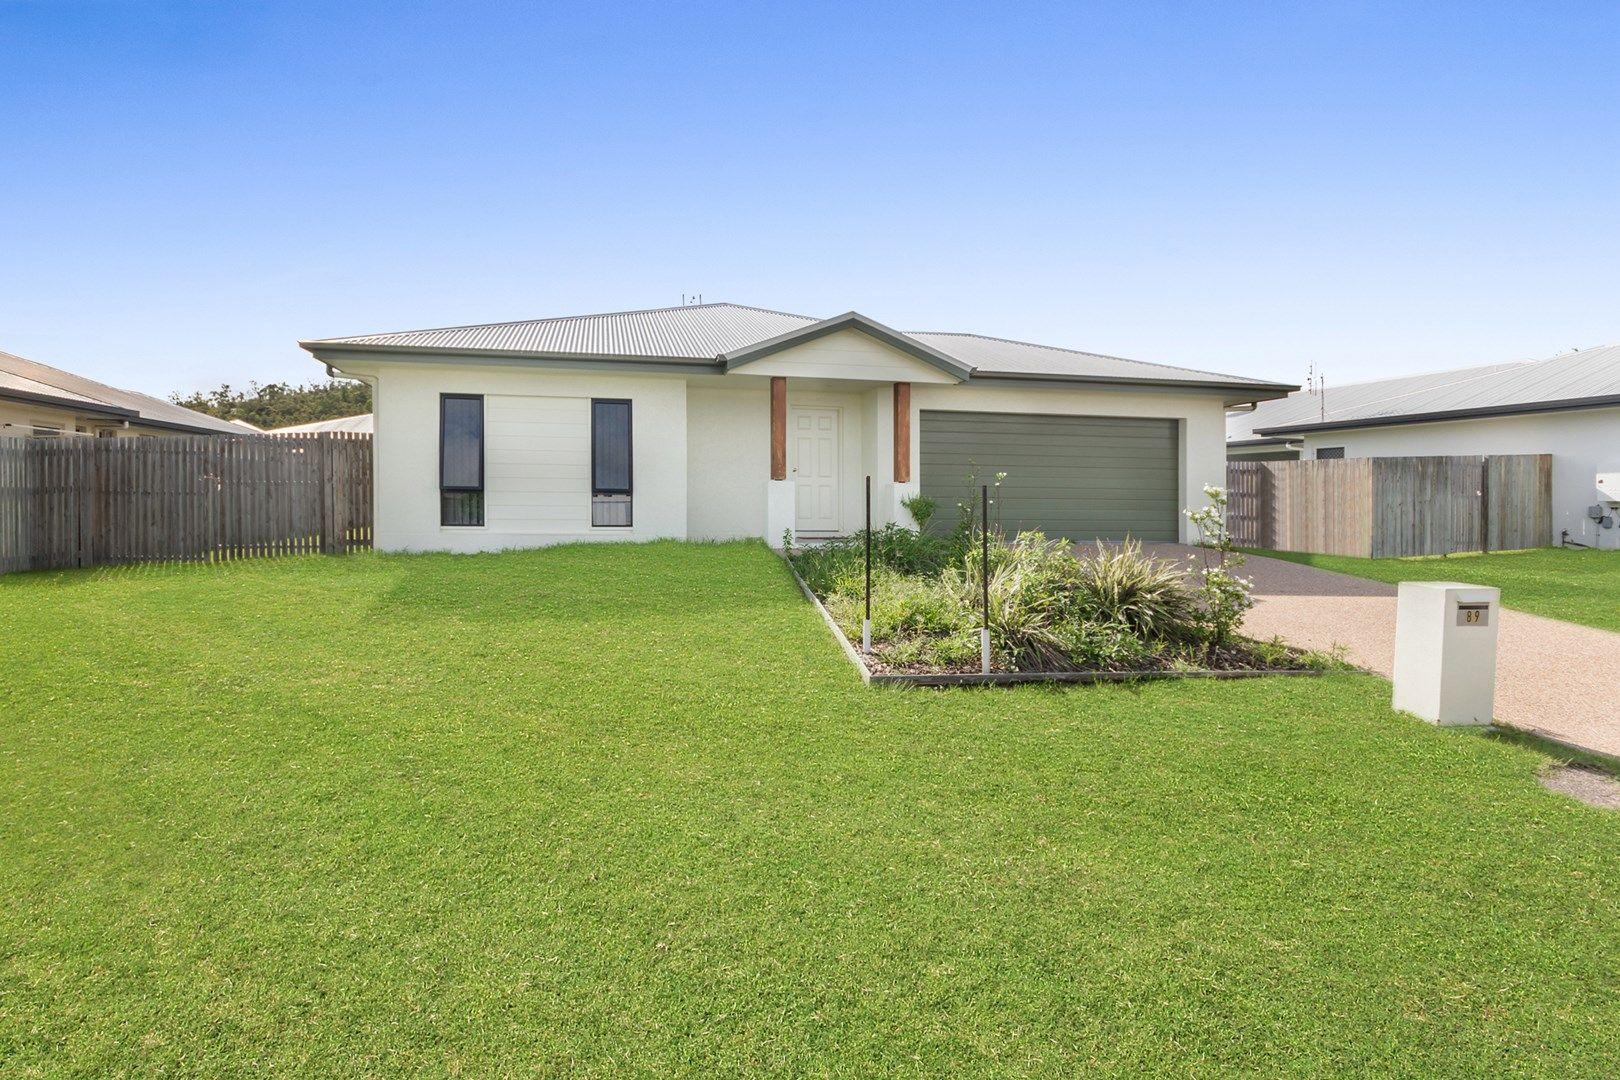 89 Innes Drive, Deeragun QLD 4818, Image 0